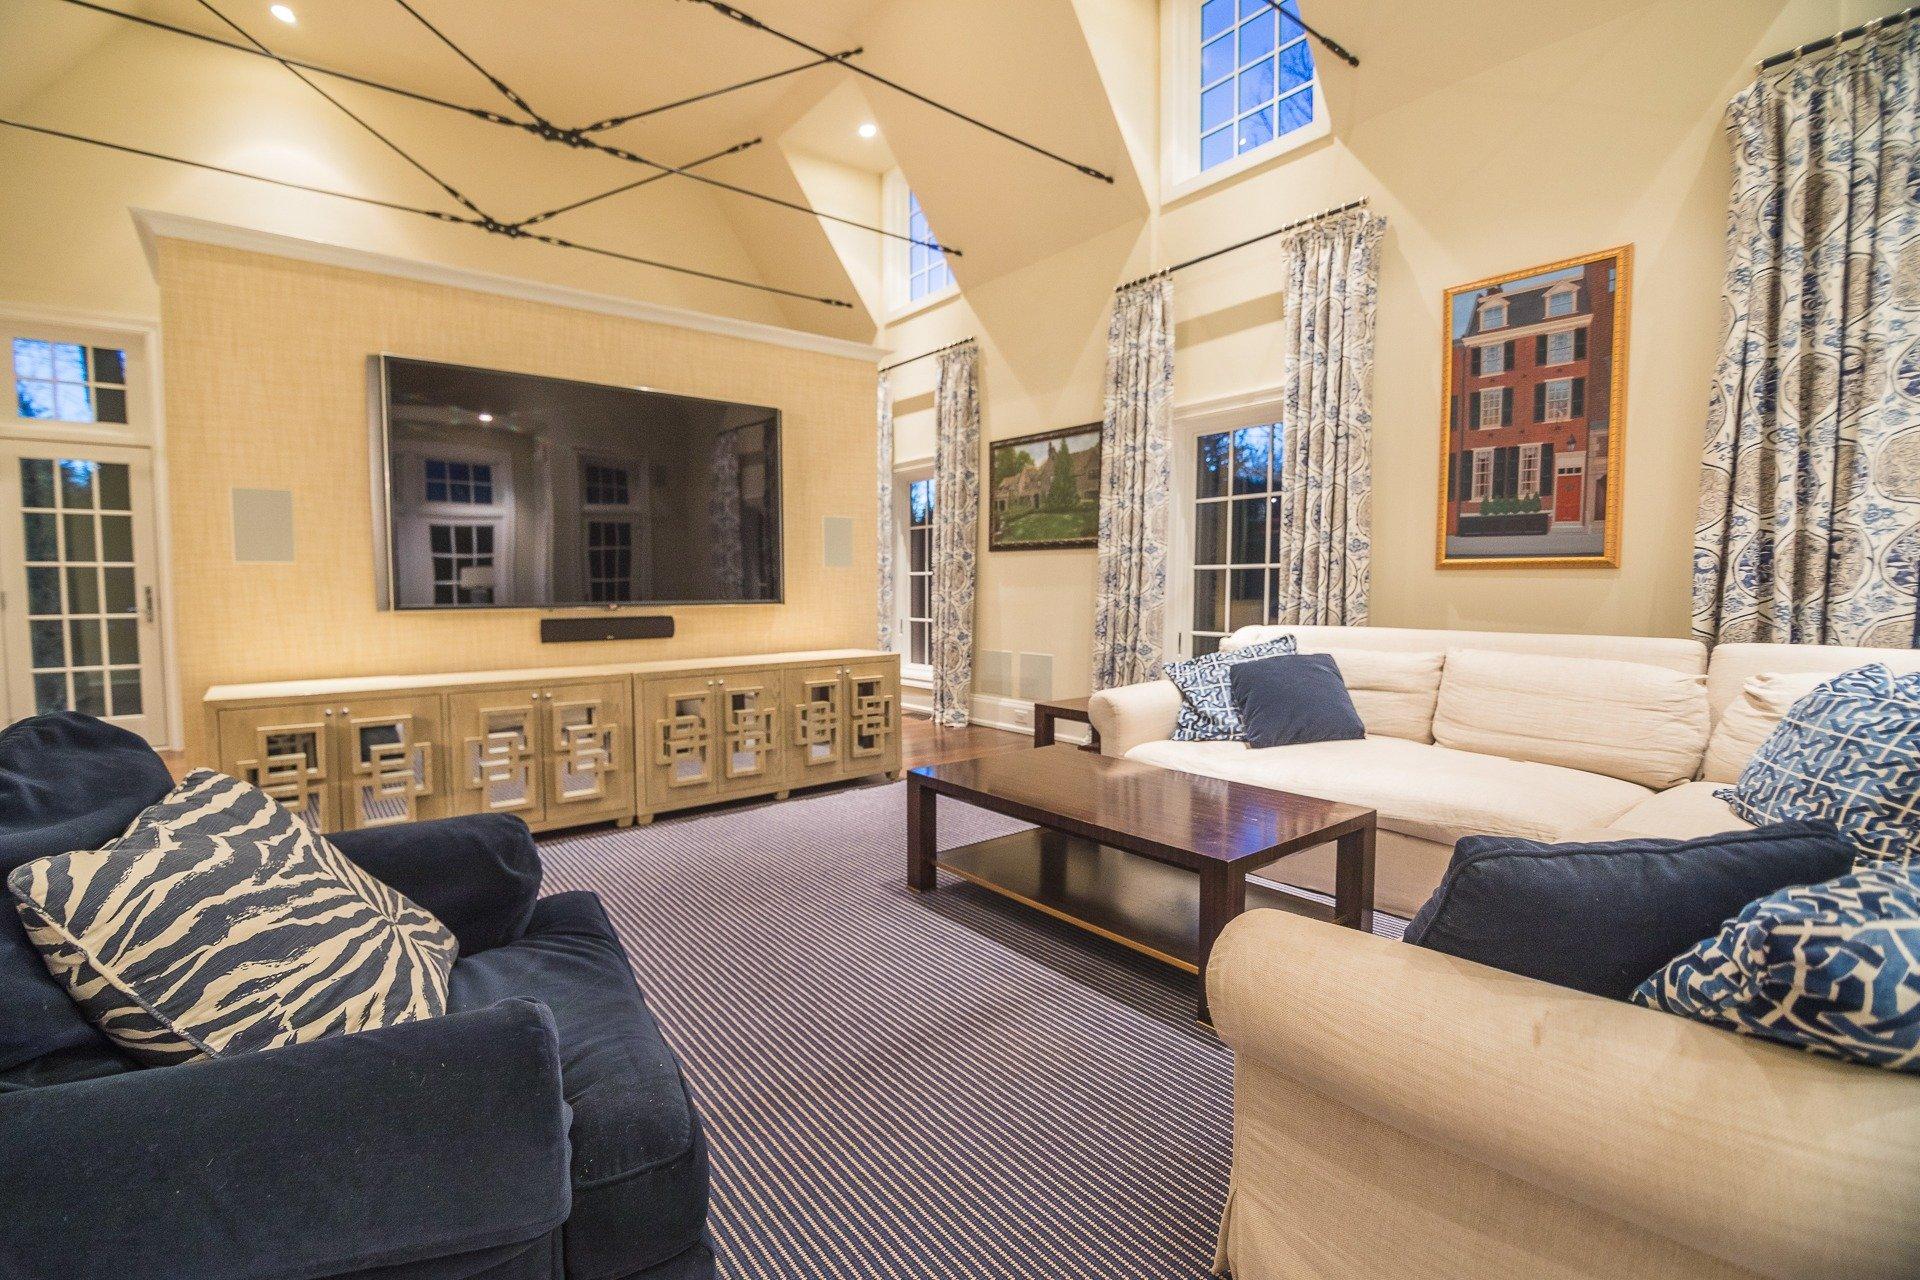 Residential Real Estate Virtual Tours